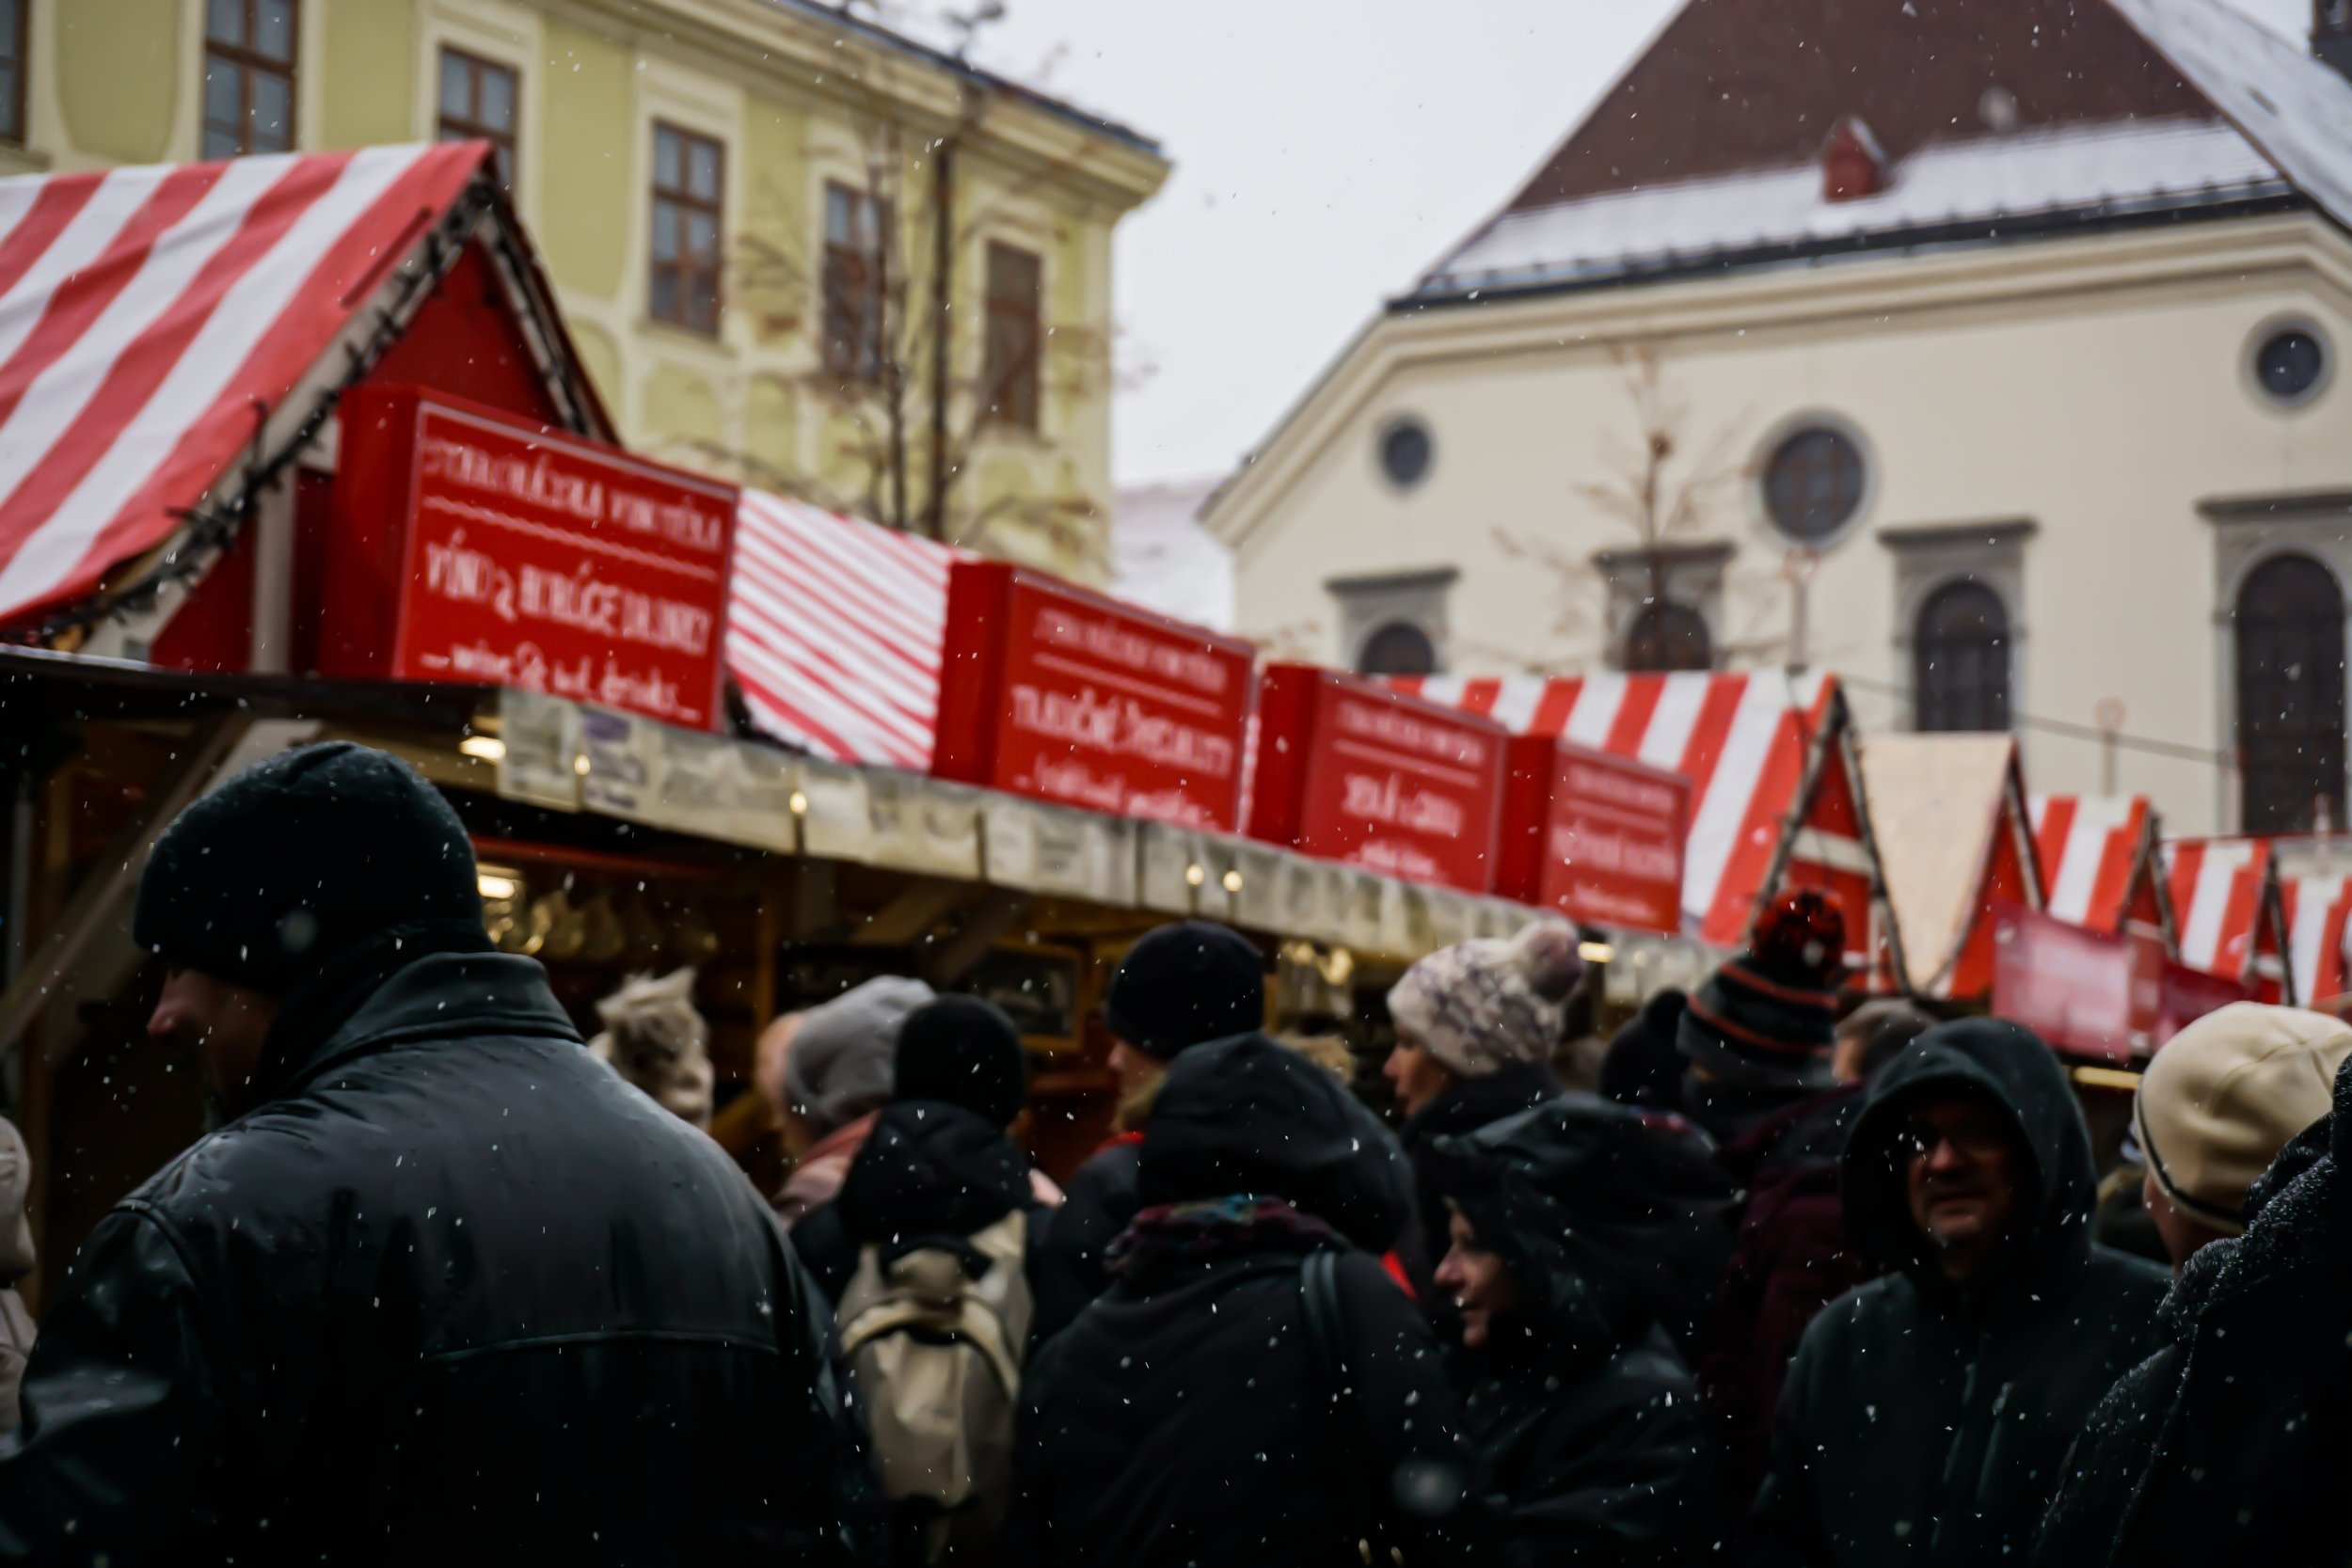 bratislava_christmast markets_market3.jpeg